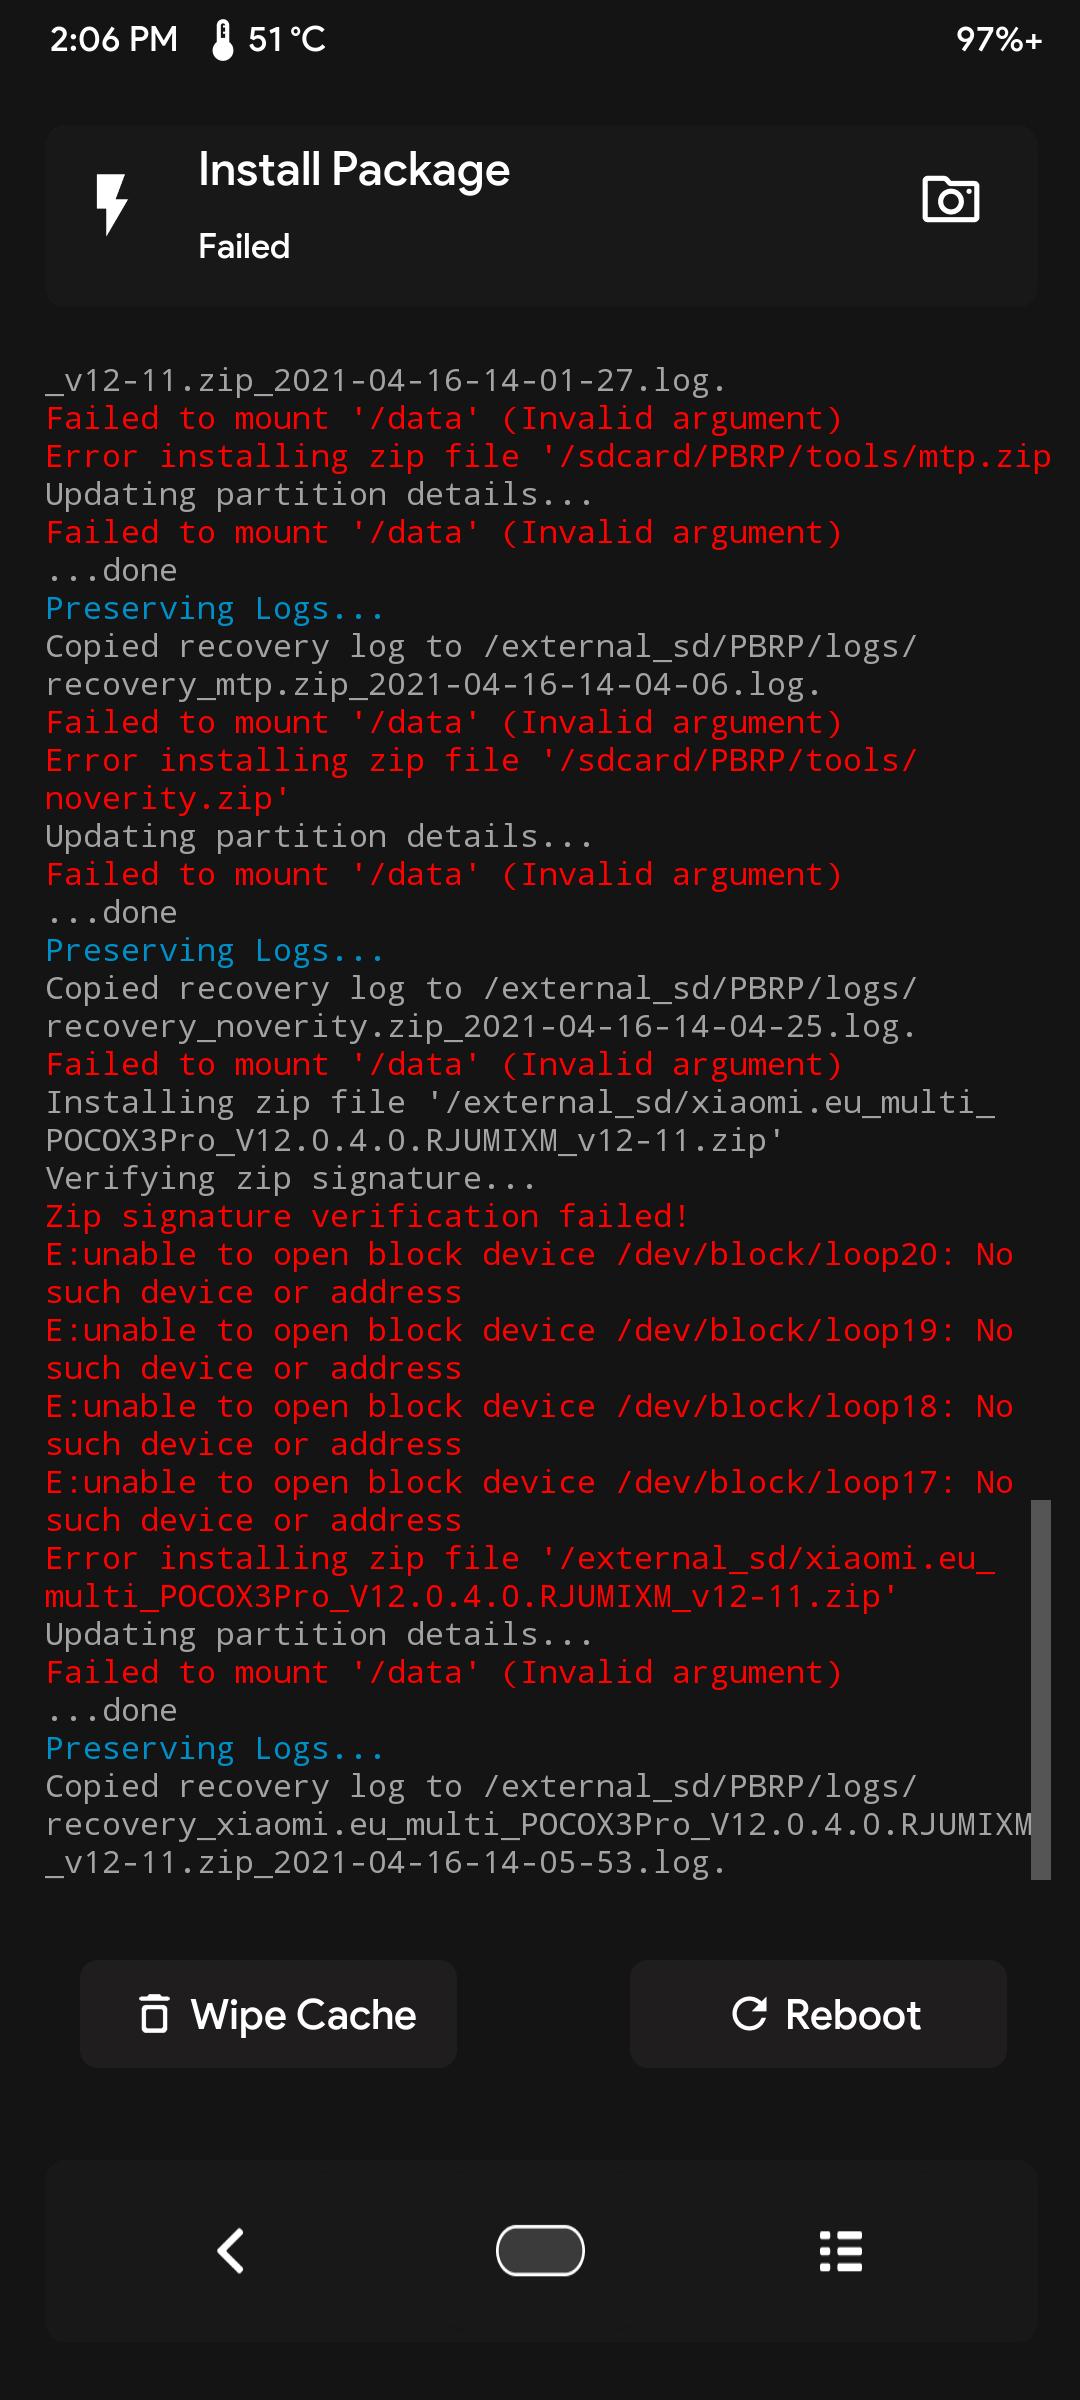 Screenshot_PBRP_2021-04-16-14-06-18[1].png